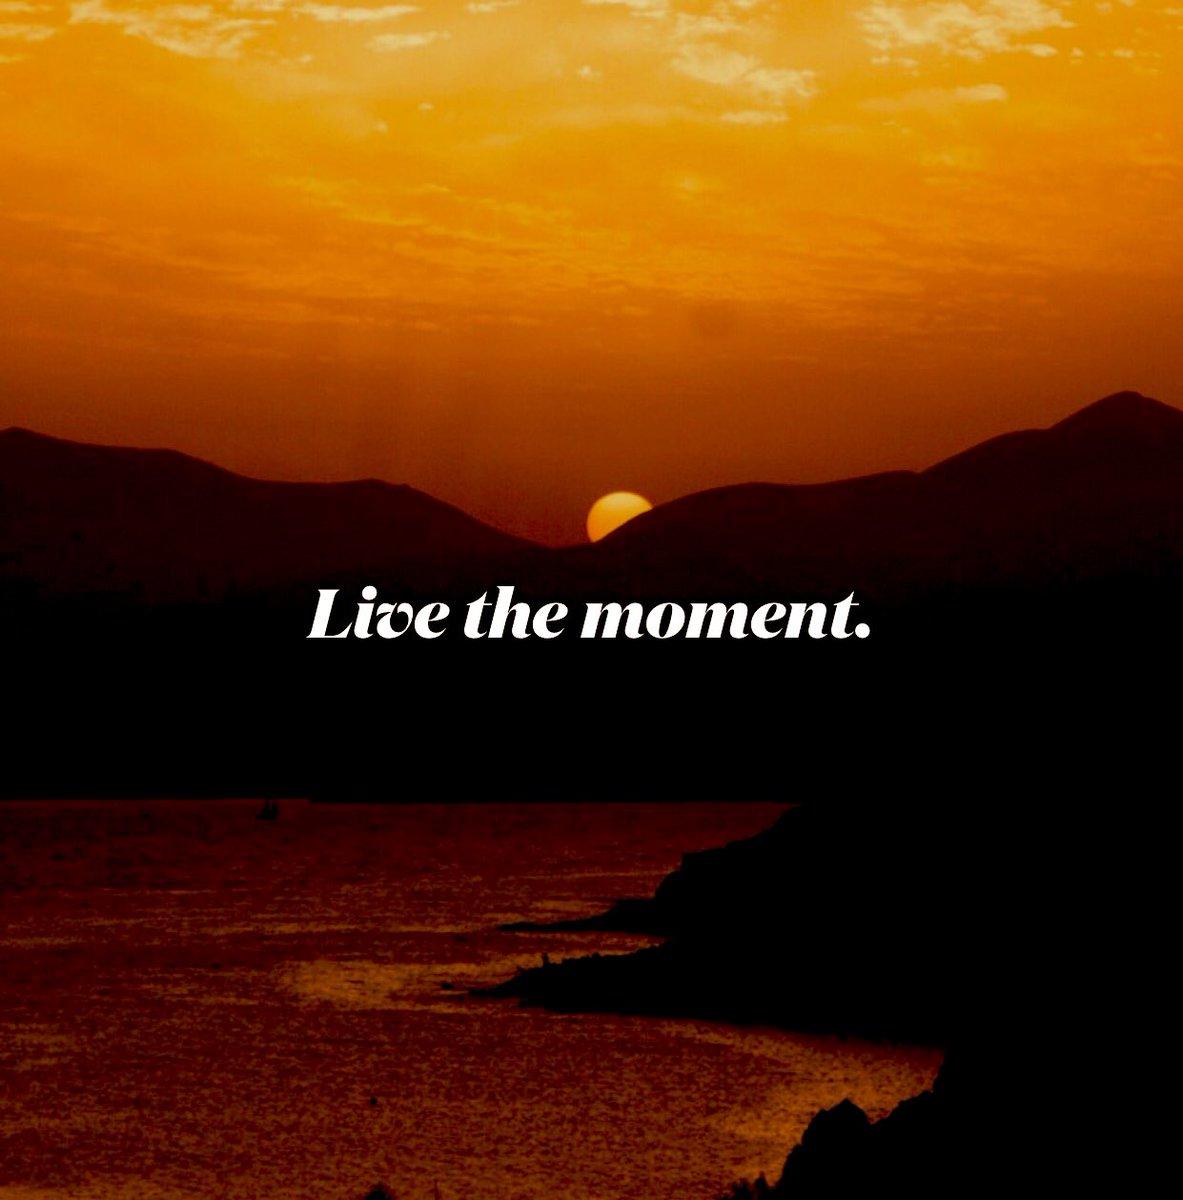 #LifeIsBeautiful #LiveLoveLearn #Inspired #positivevibin #Clearly #ItsAllLove #LiveLiveLearn #BeLight 😍#BelieveInYourself #ItsYourLife #ChooseLove #ChooseLife #BeJoyful #FridayMotivation #FridayMorning #FridayVibes #FridayGuidance #Push #ForwardMovement #Yes #Still